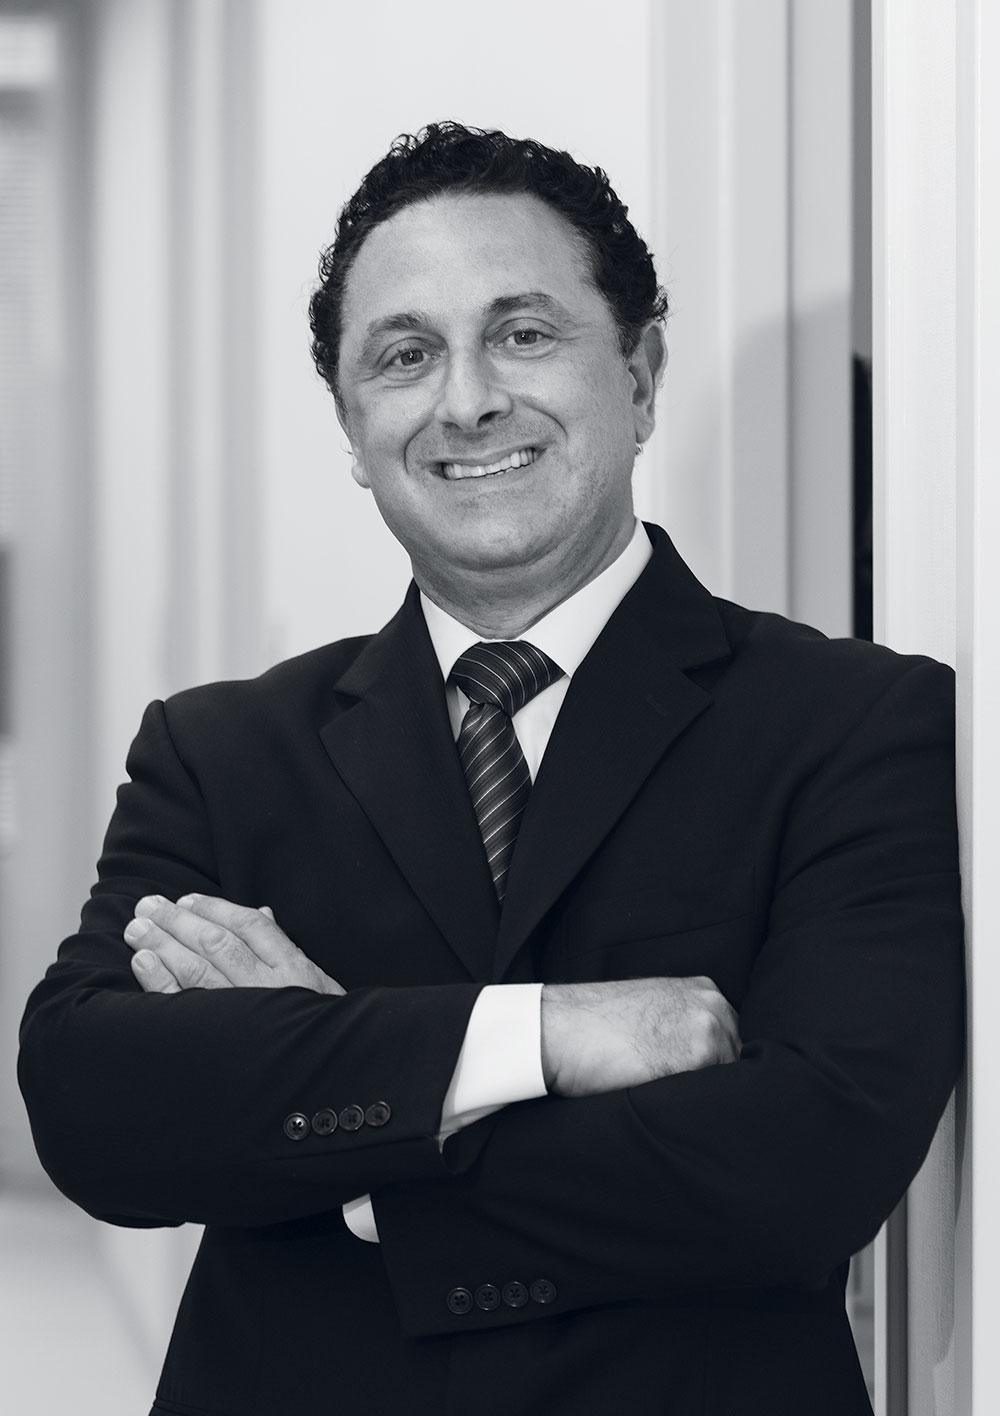 George Bitar